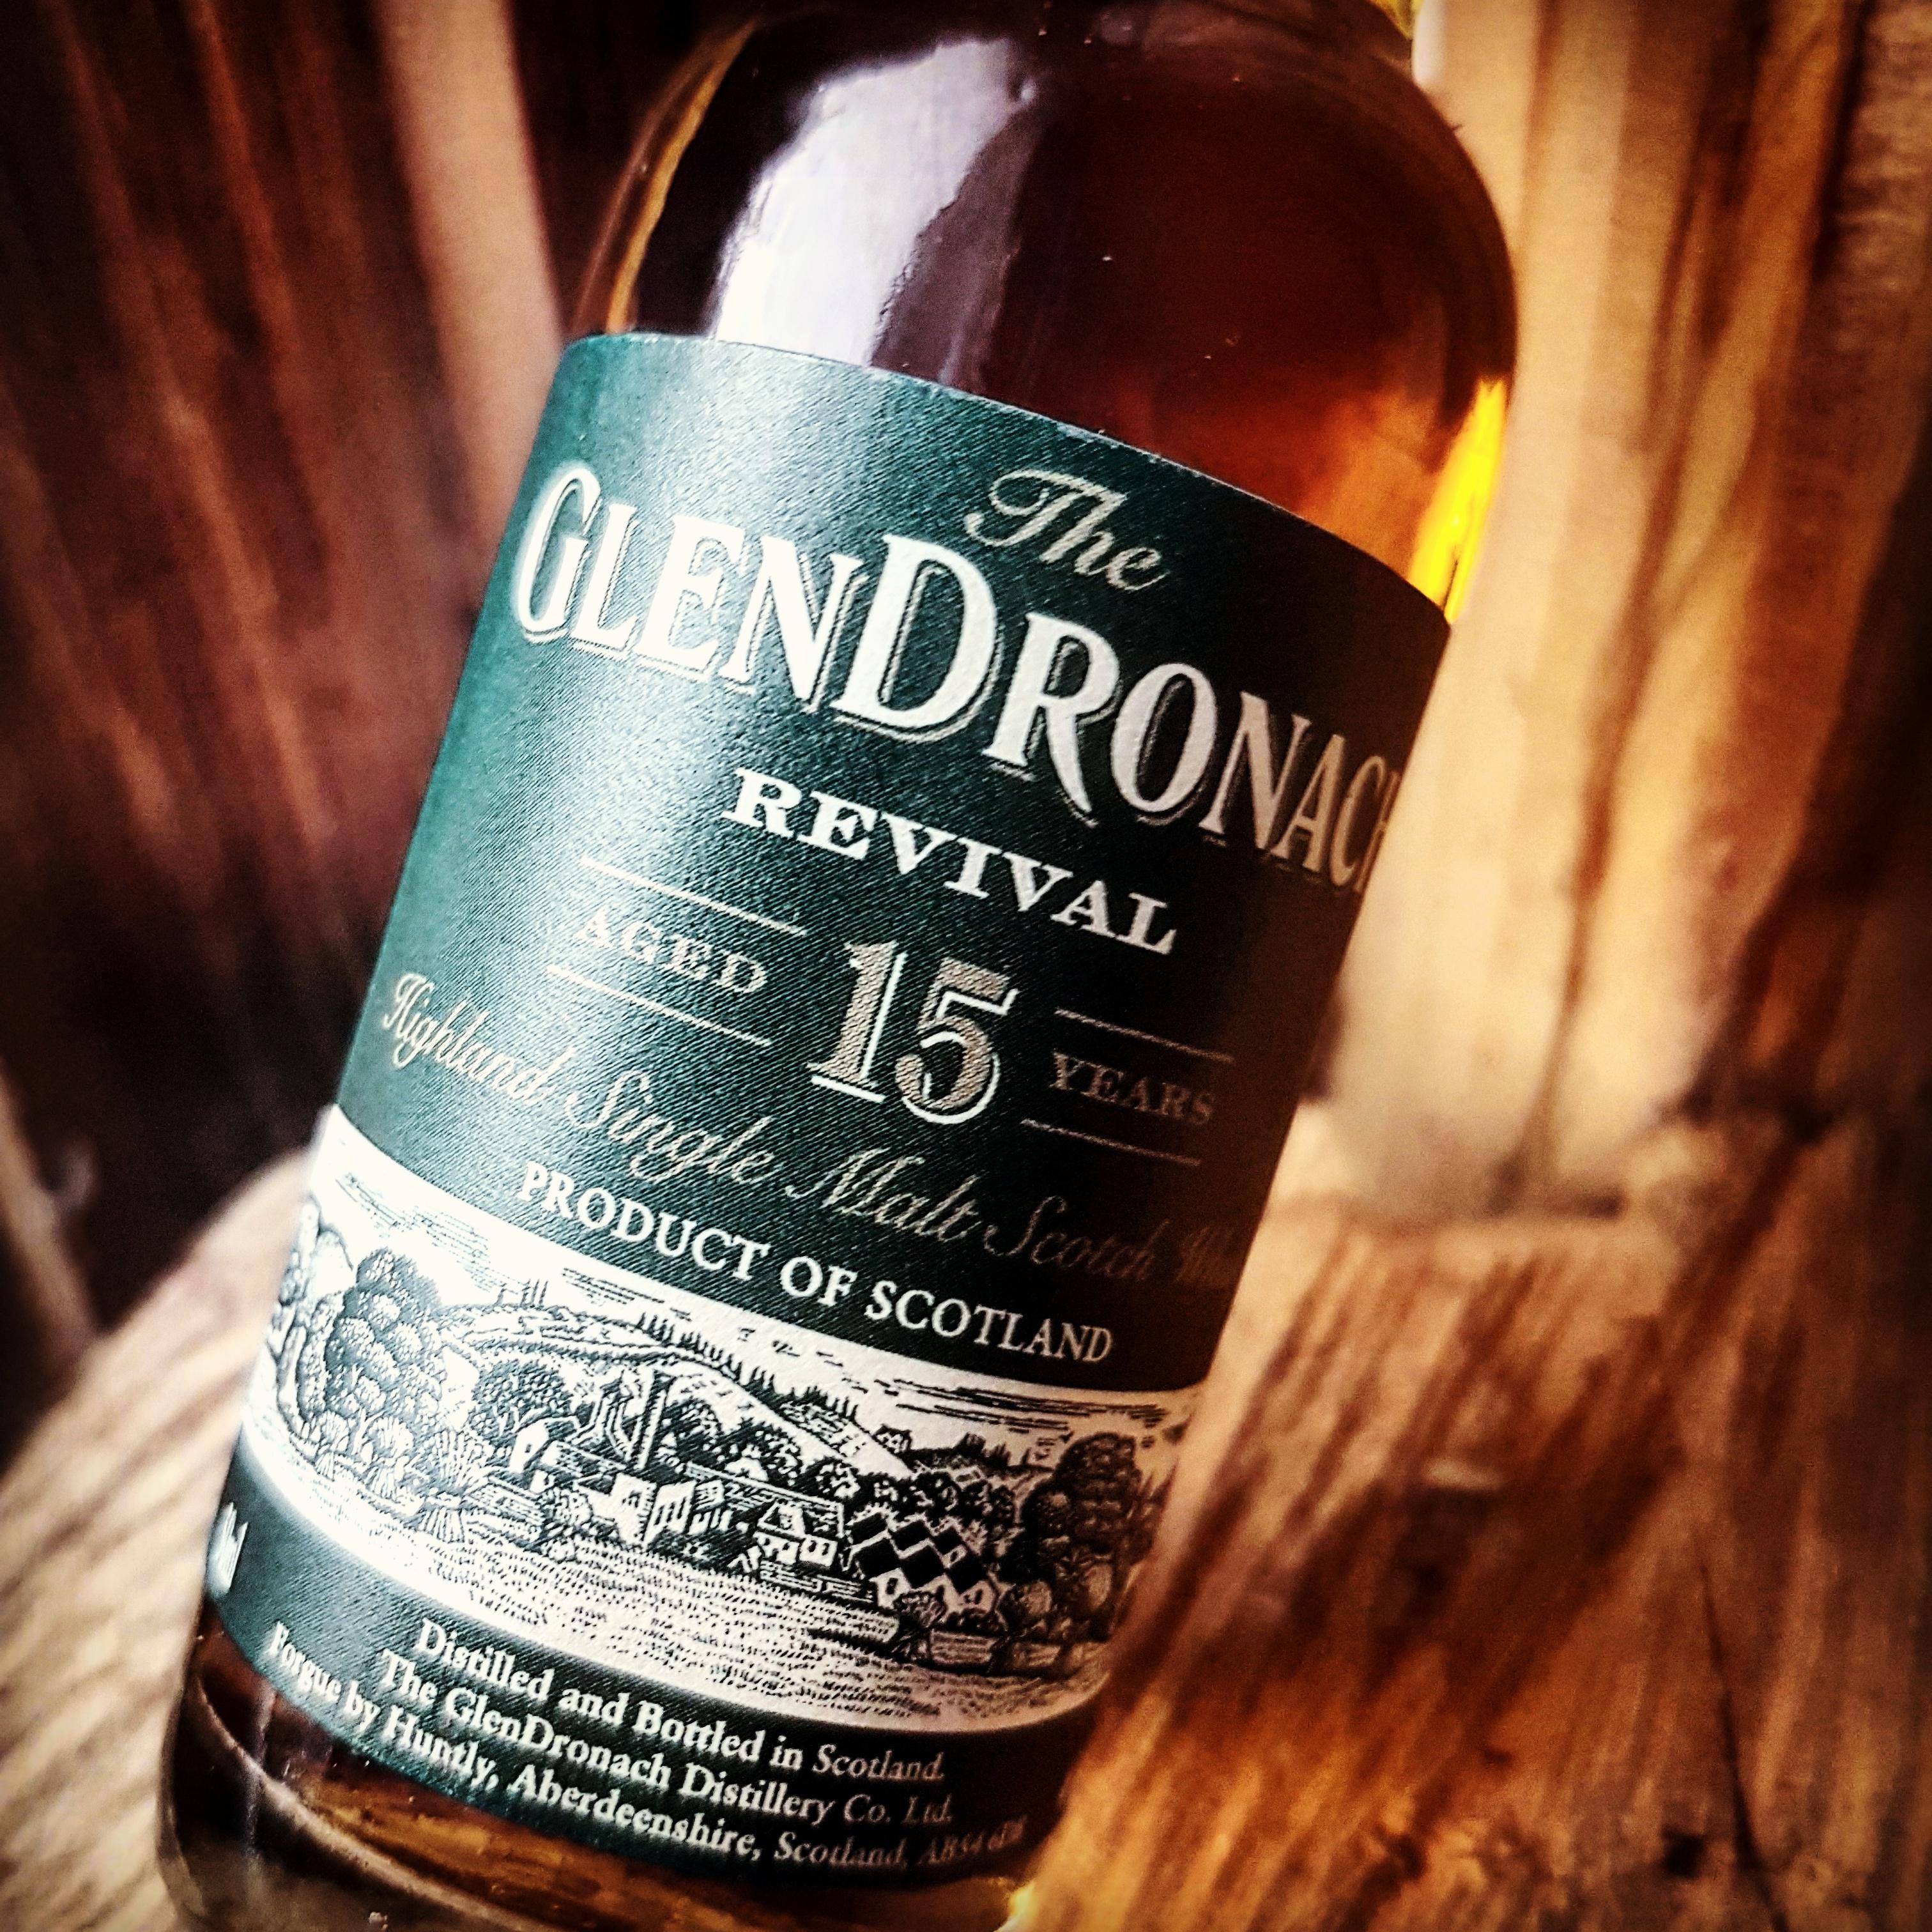 The GlenDronach Revival 15 Jahre Highland Single Malt Scotch Whisky